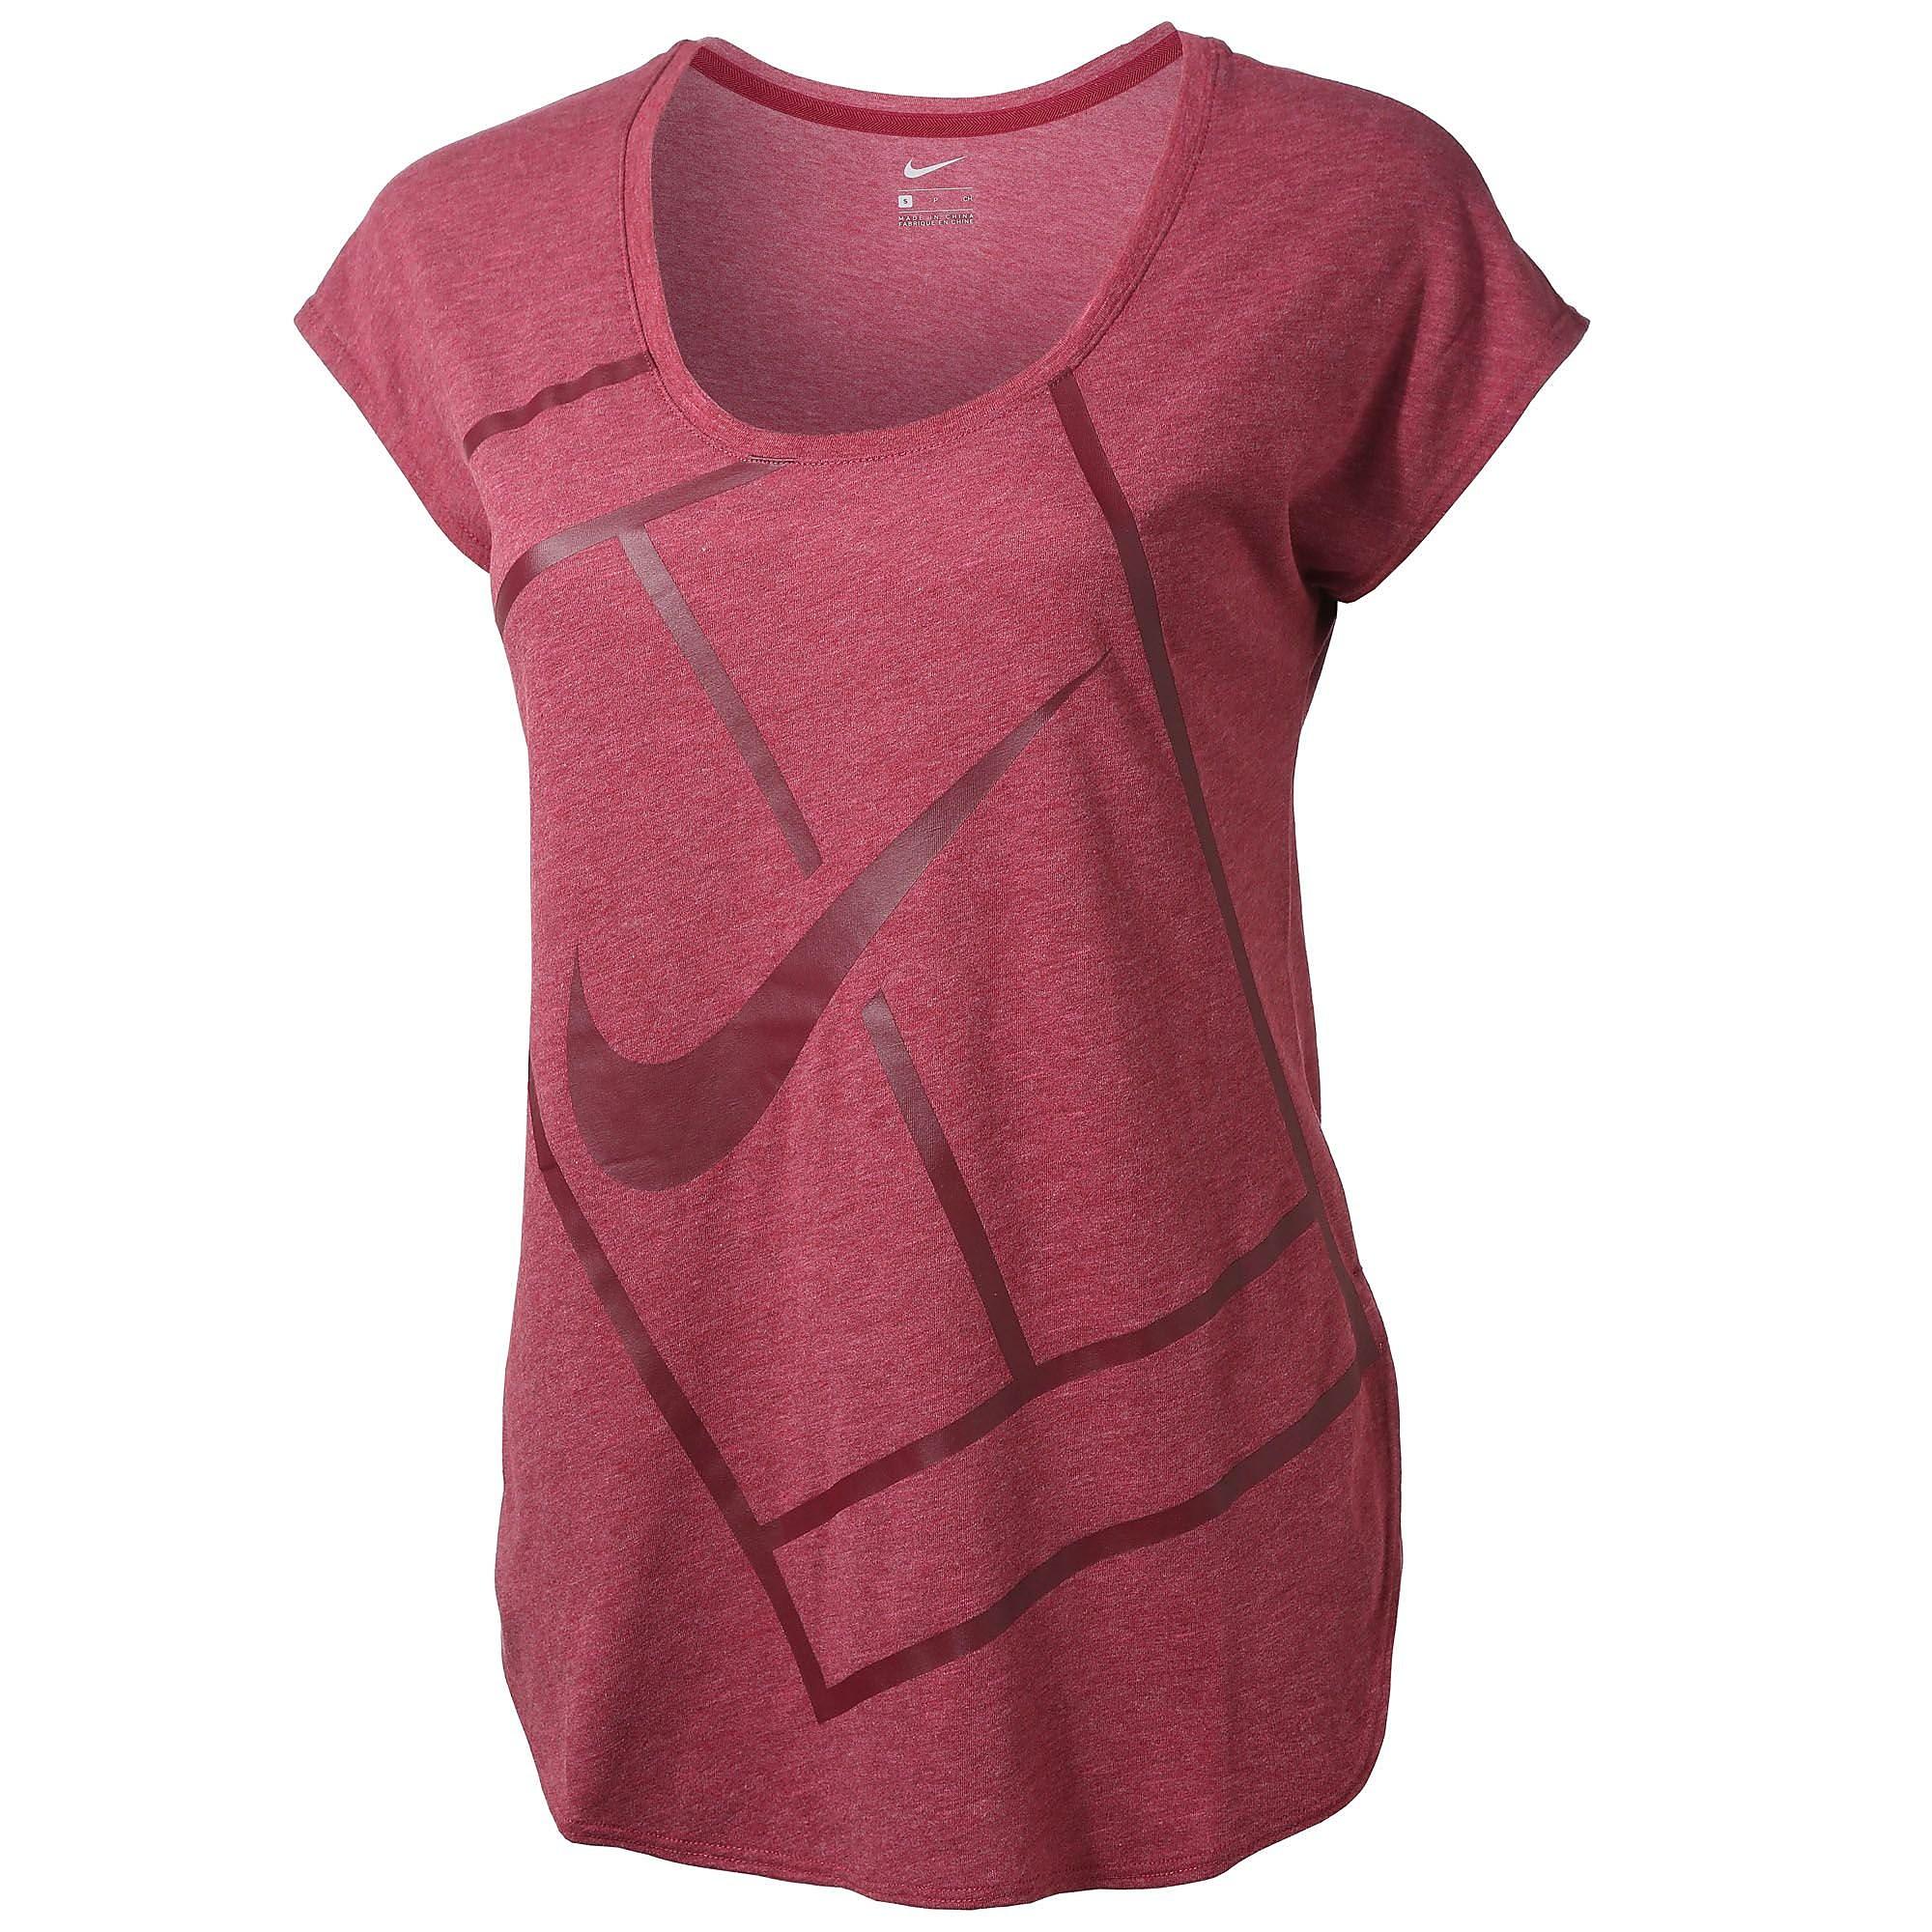 Nike PRACTICE TOP